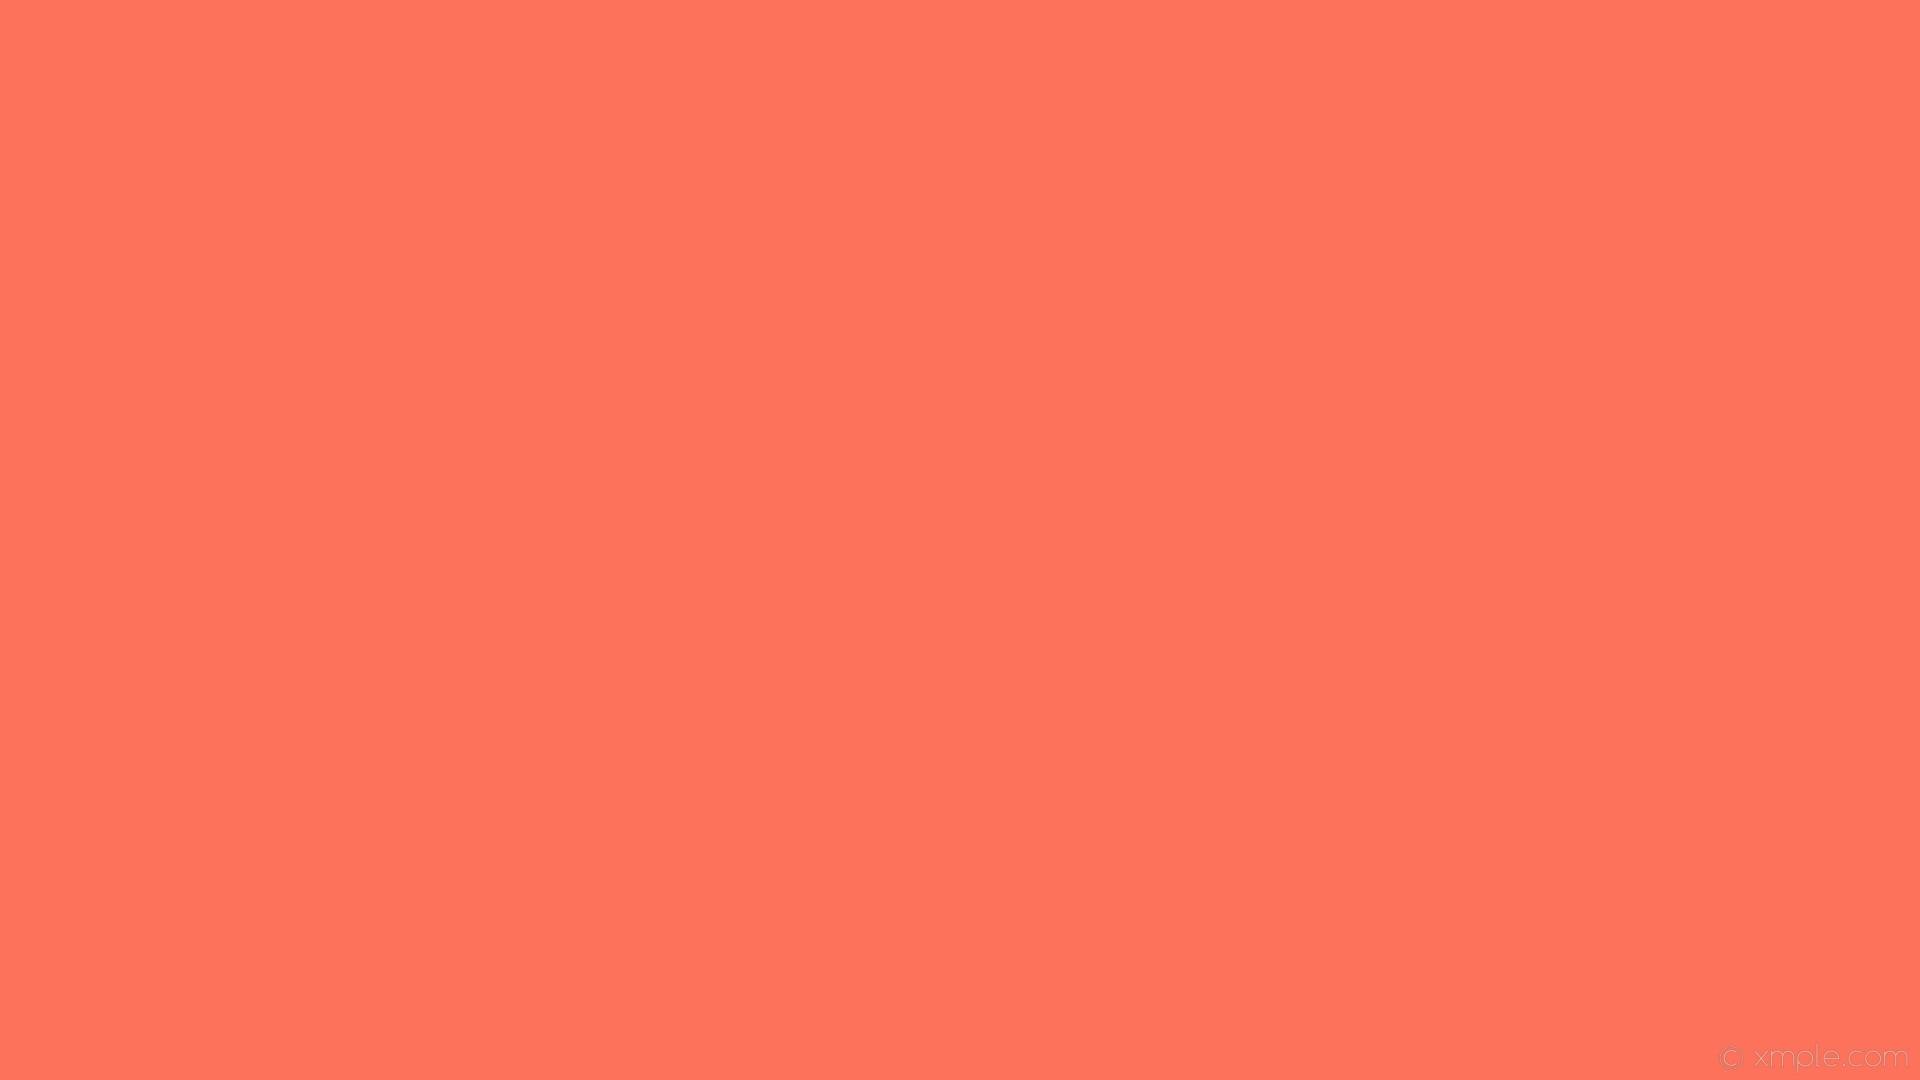 wallpaper single plain solid color one colour red #fc725a